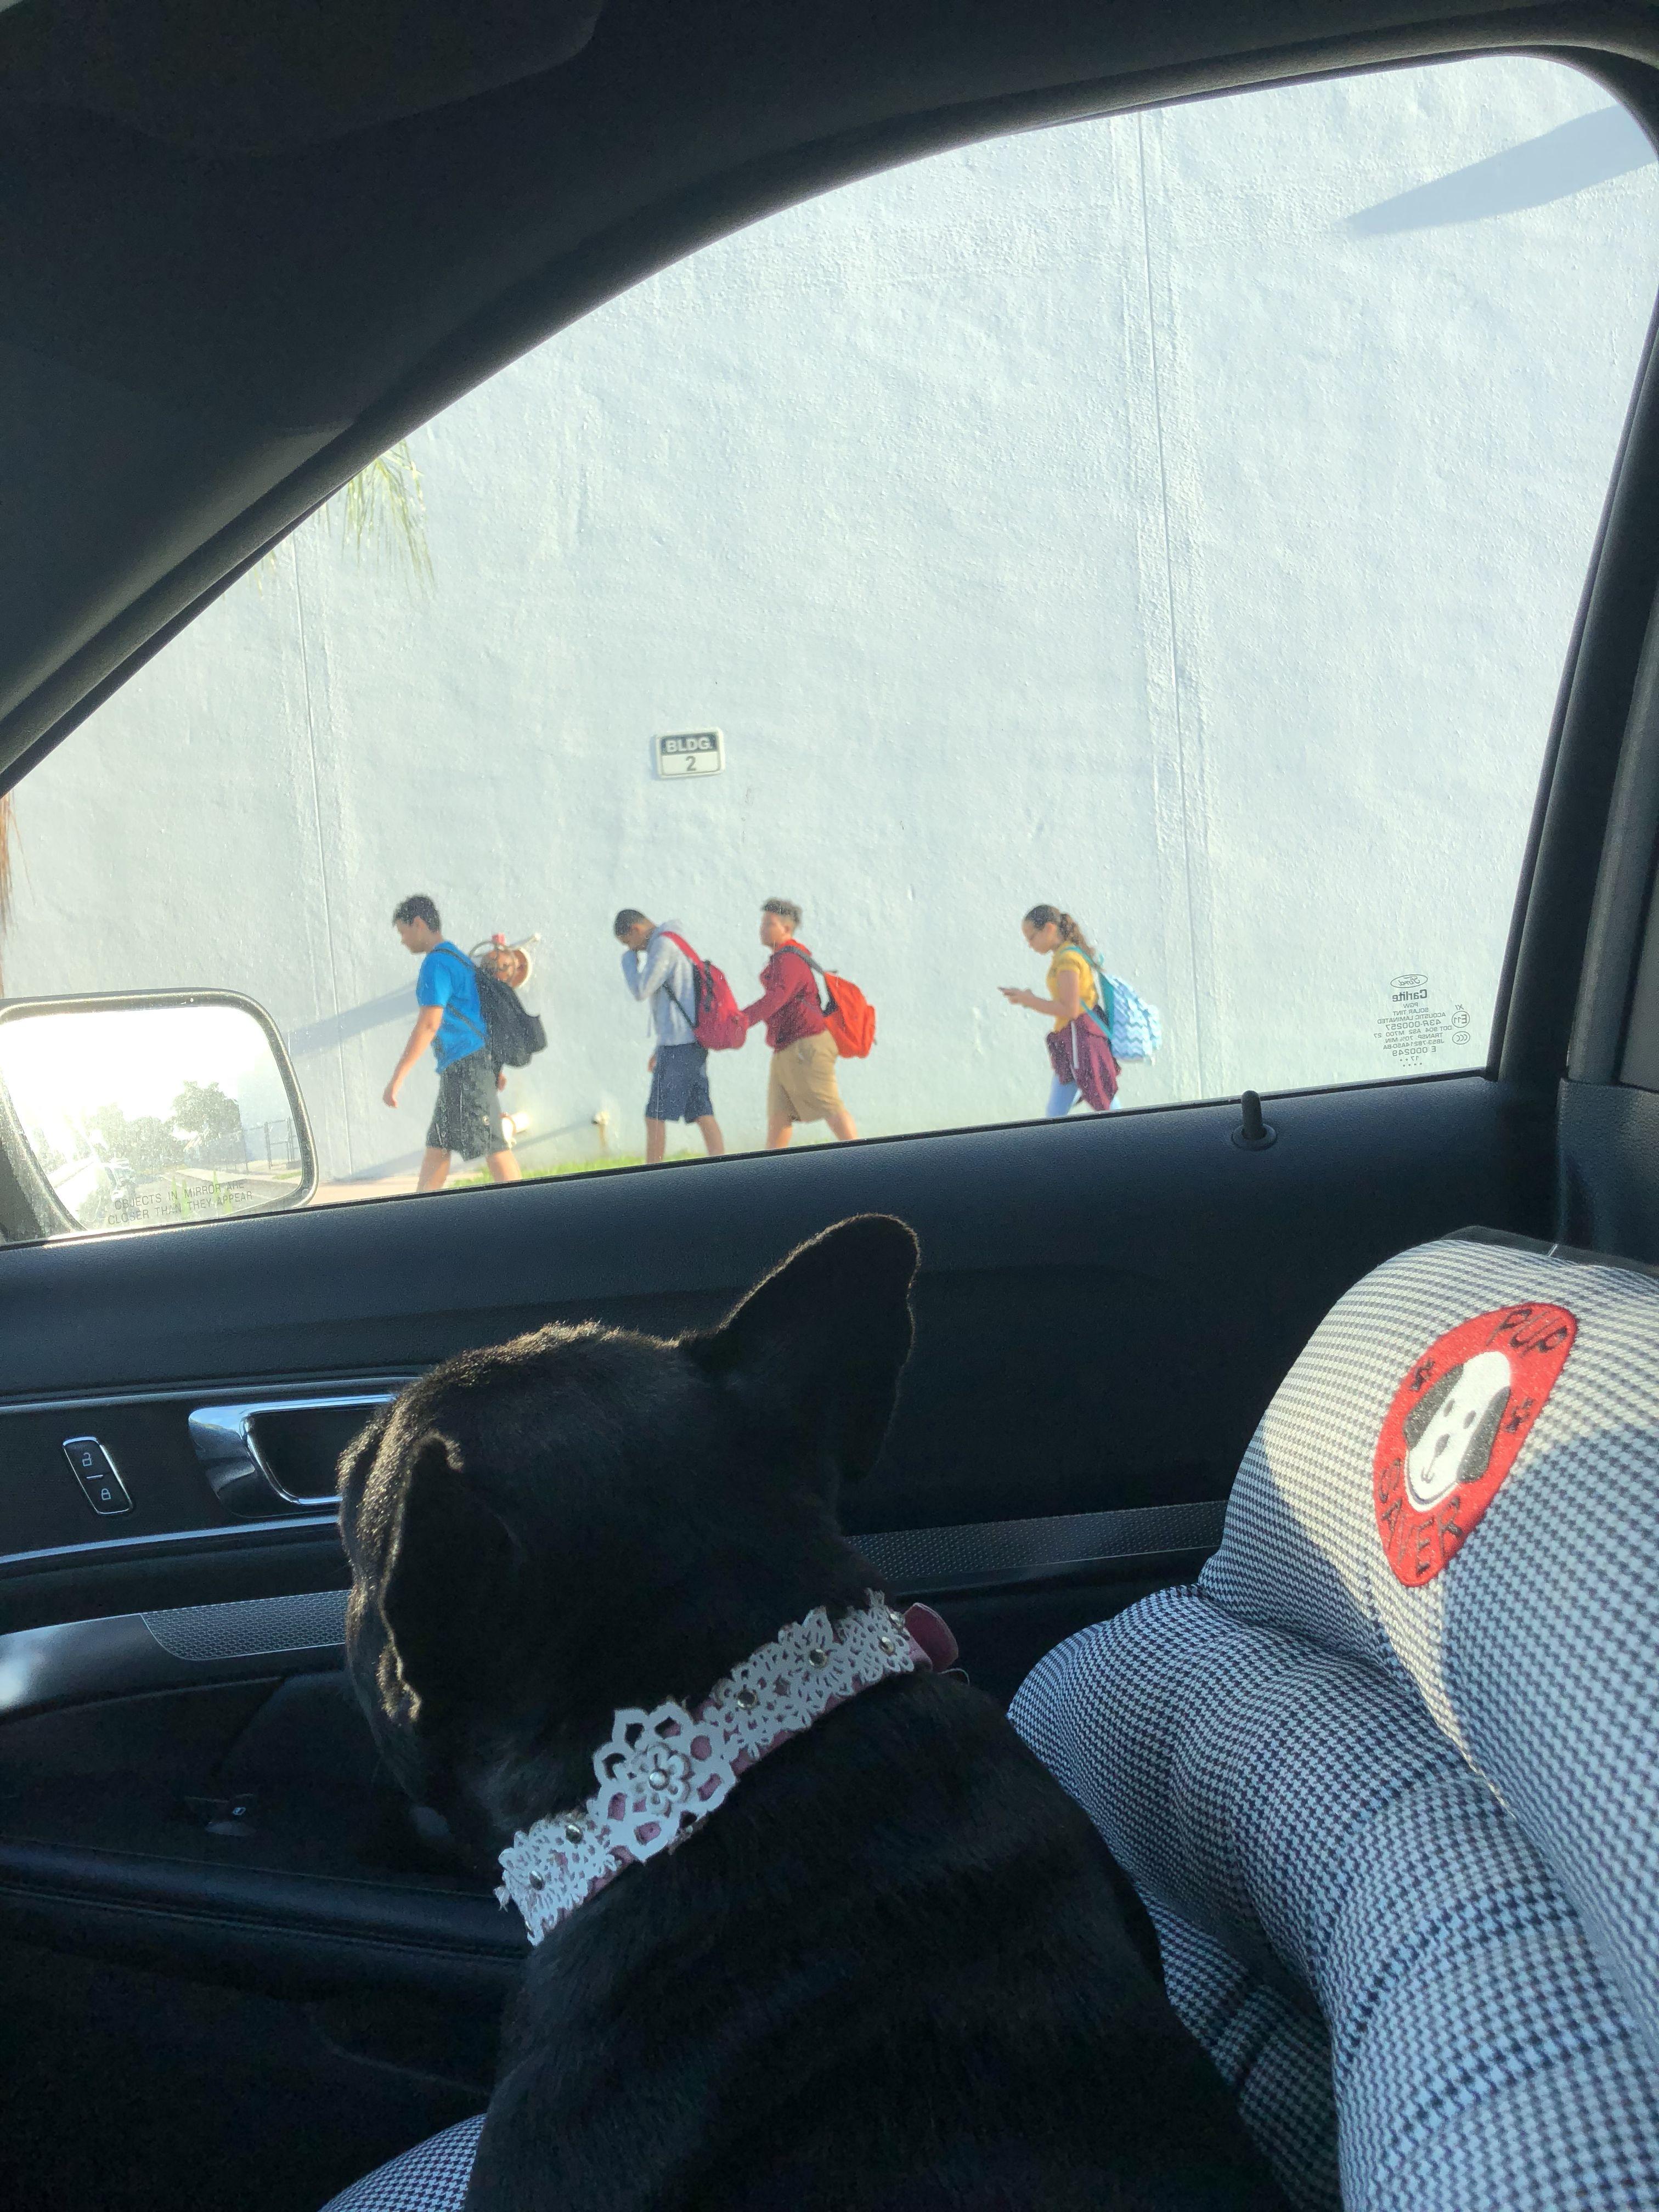 Watching my lil humans off to school 💗🐶 danshislagertha